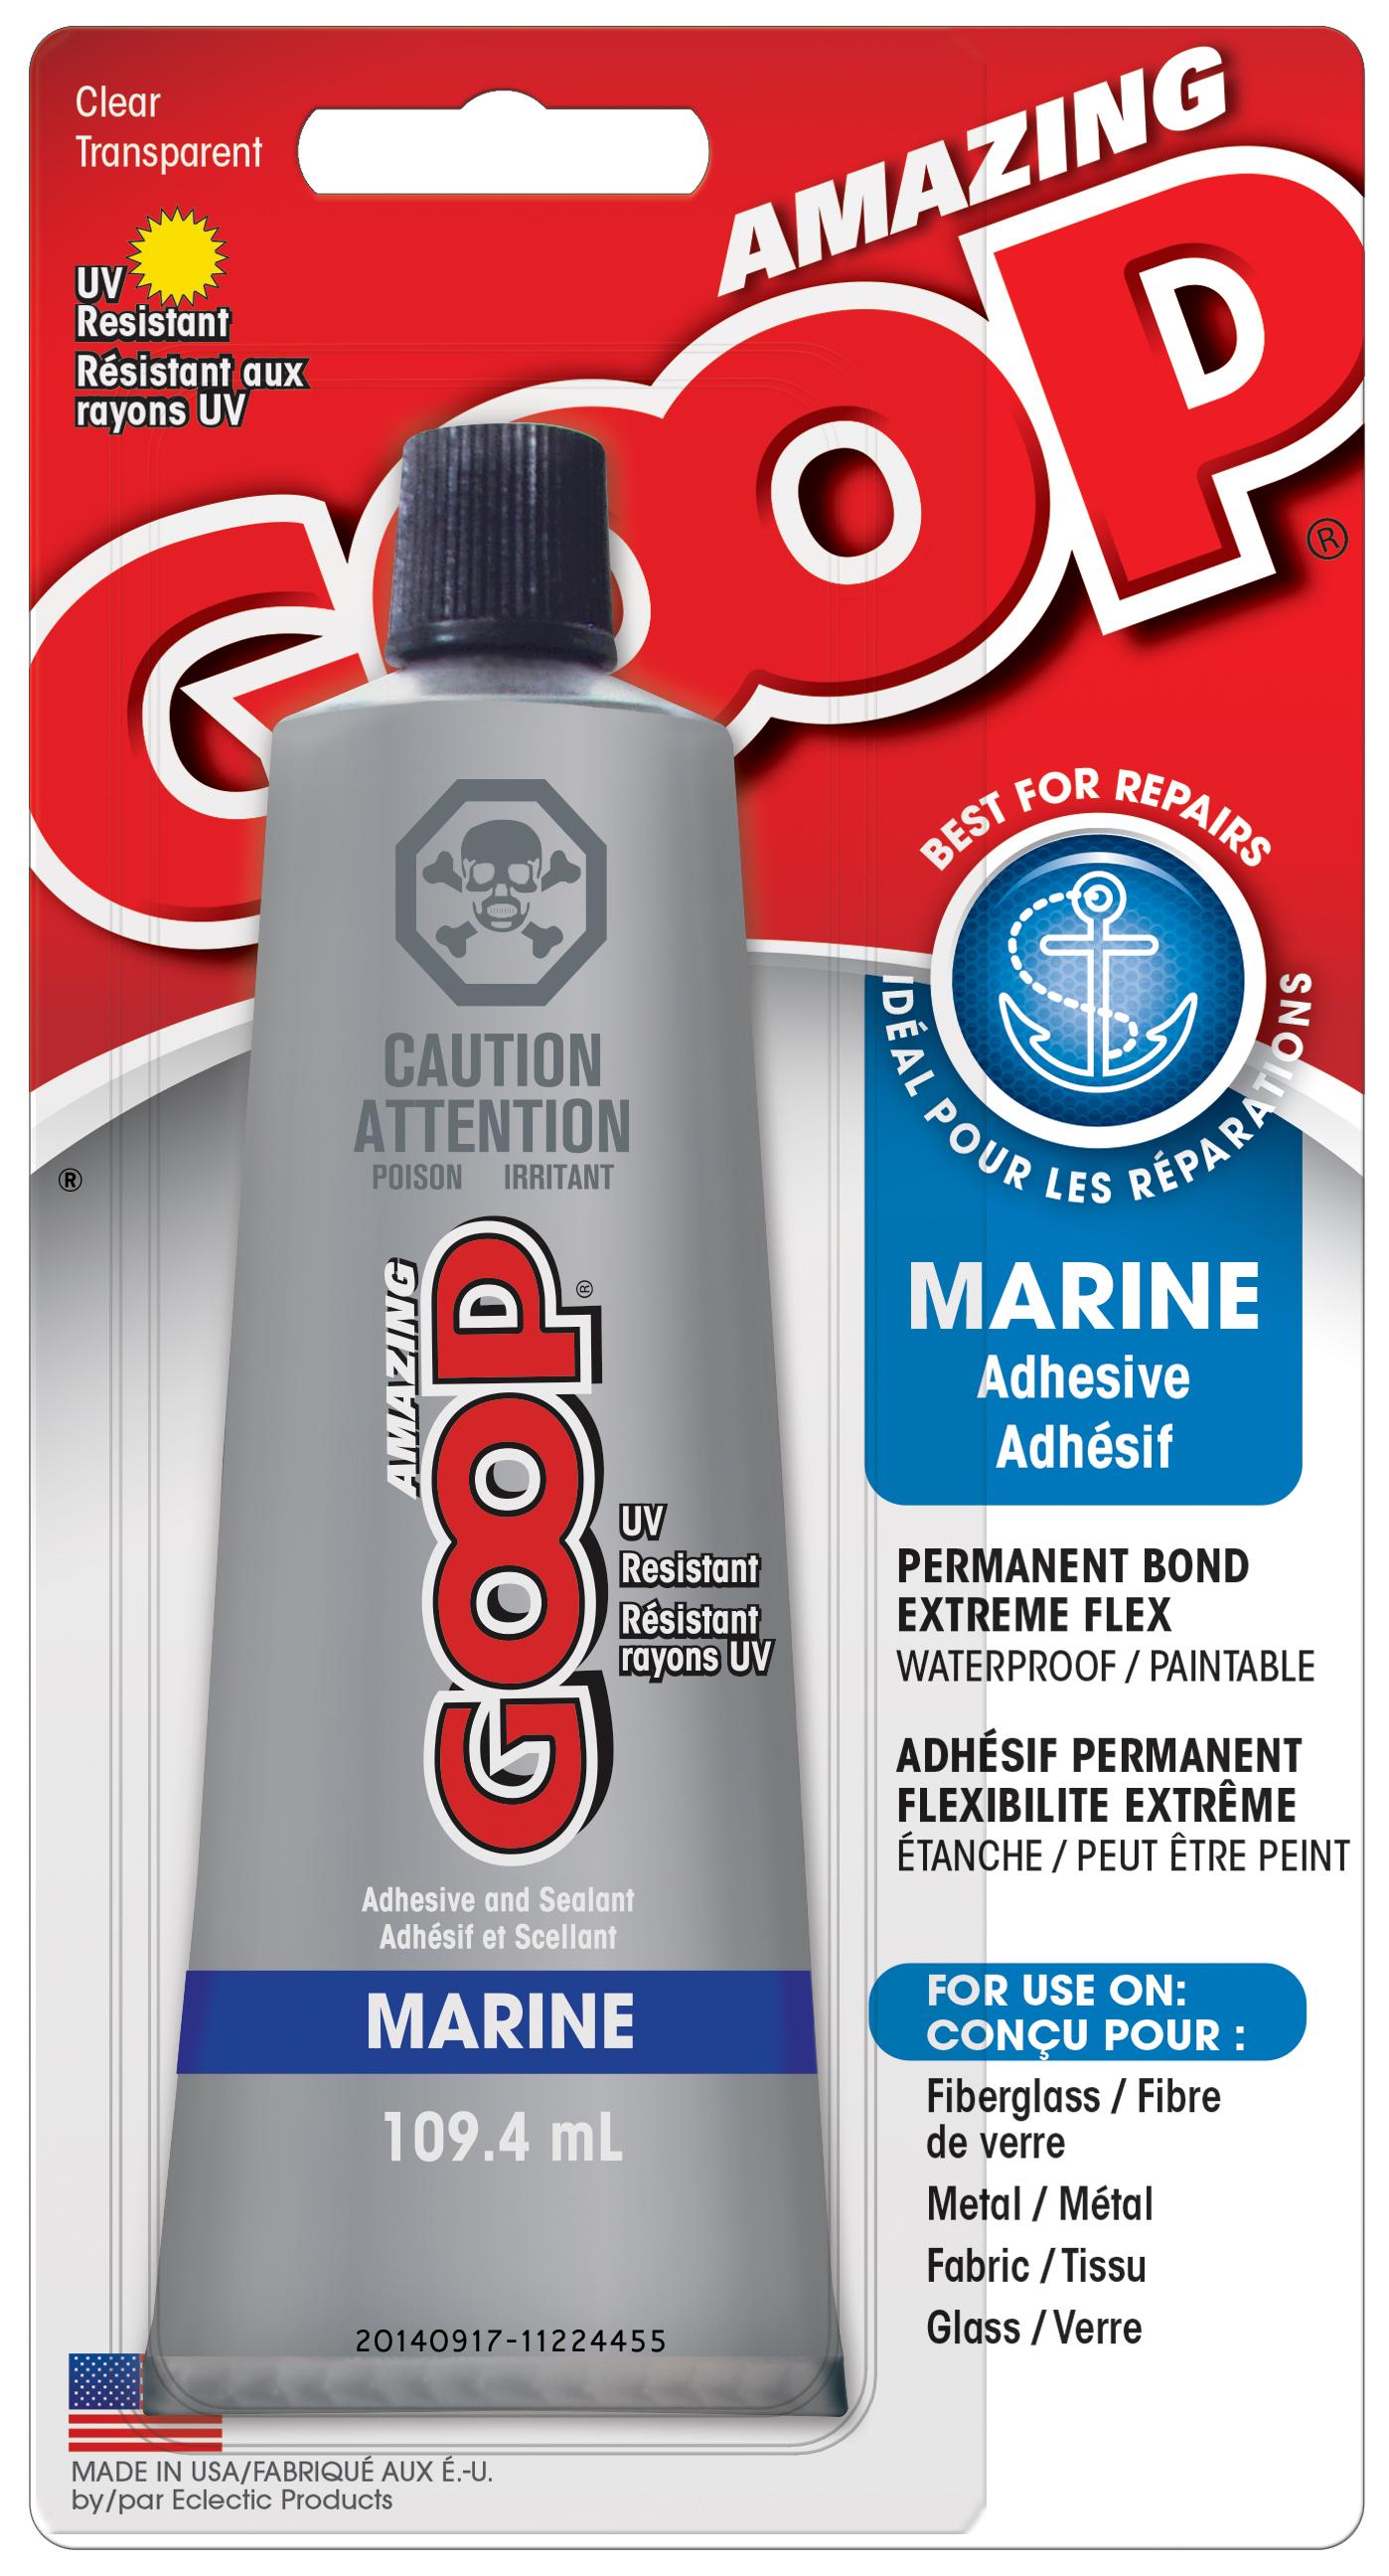 Amazing GOOP Marine Amazing GOOP Adhesives Products